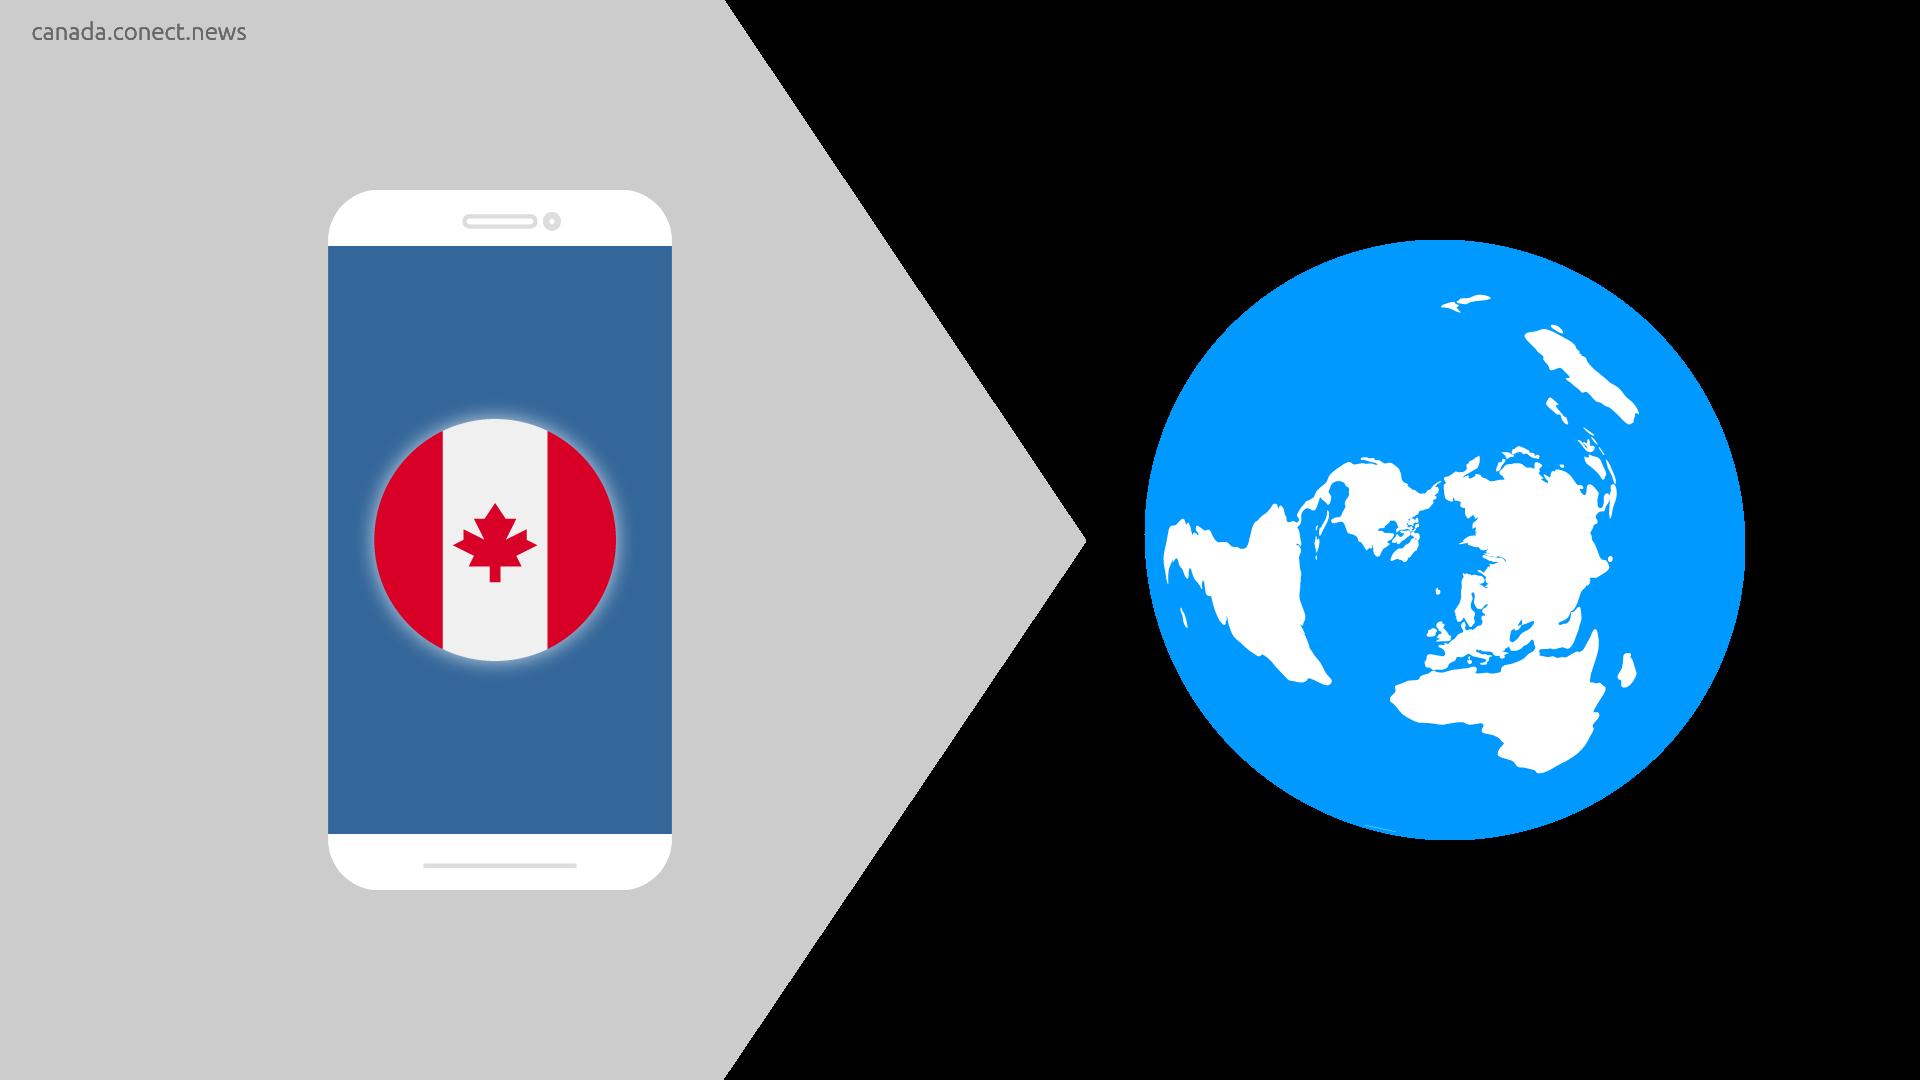 Kanada-international@conect_news